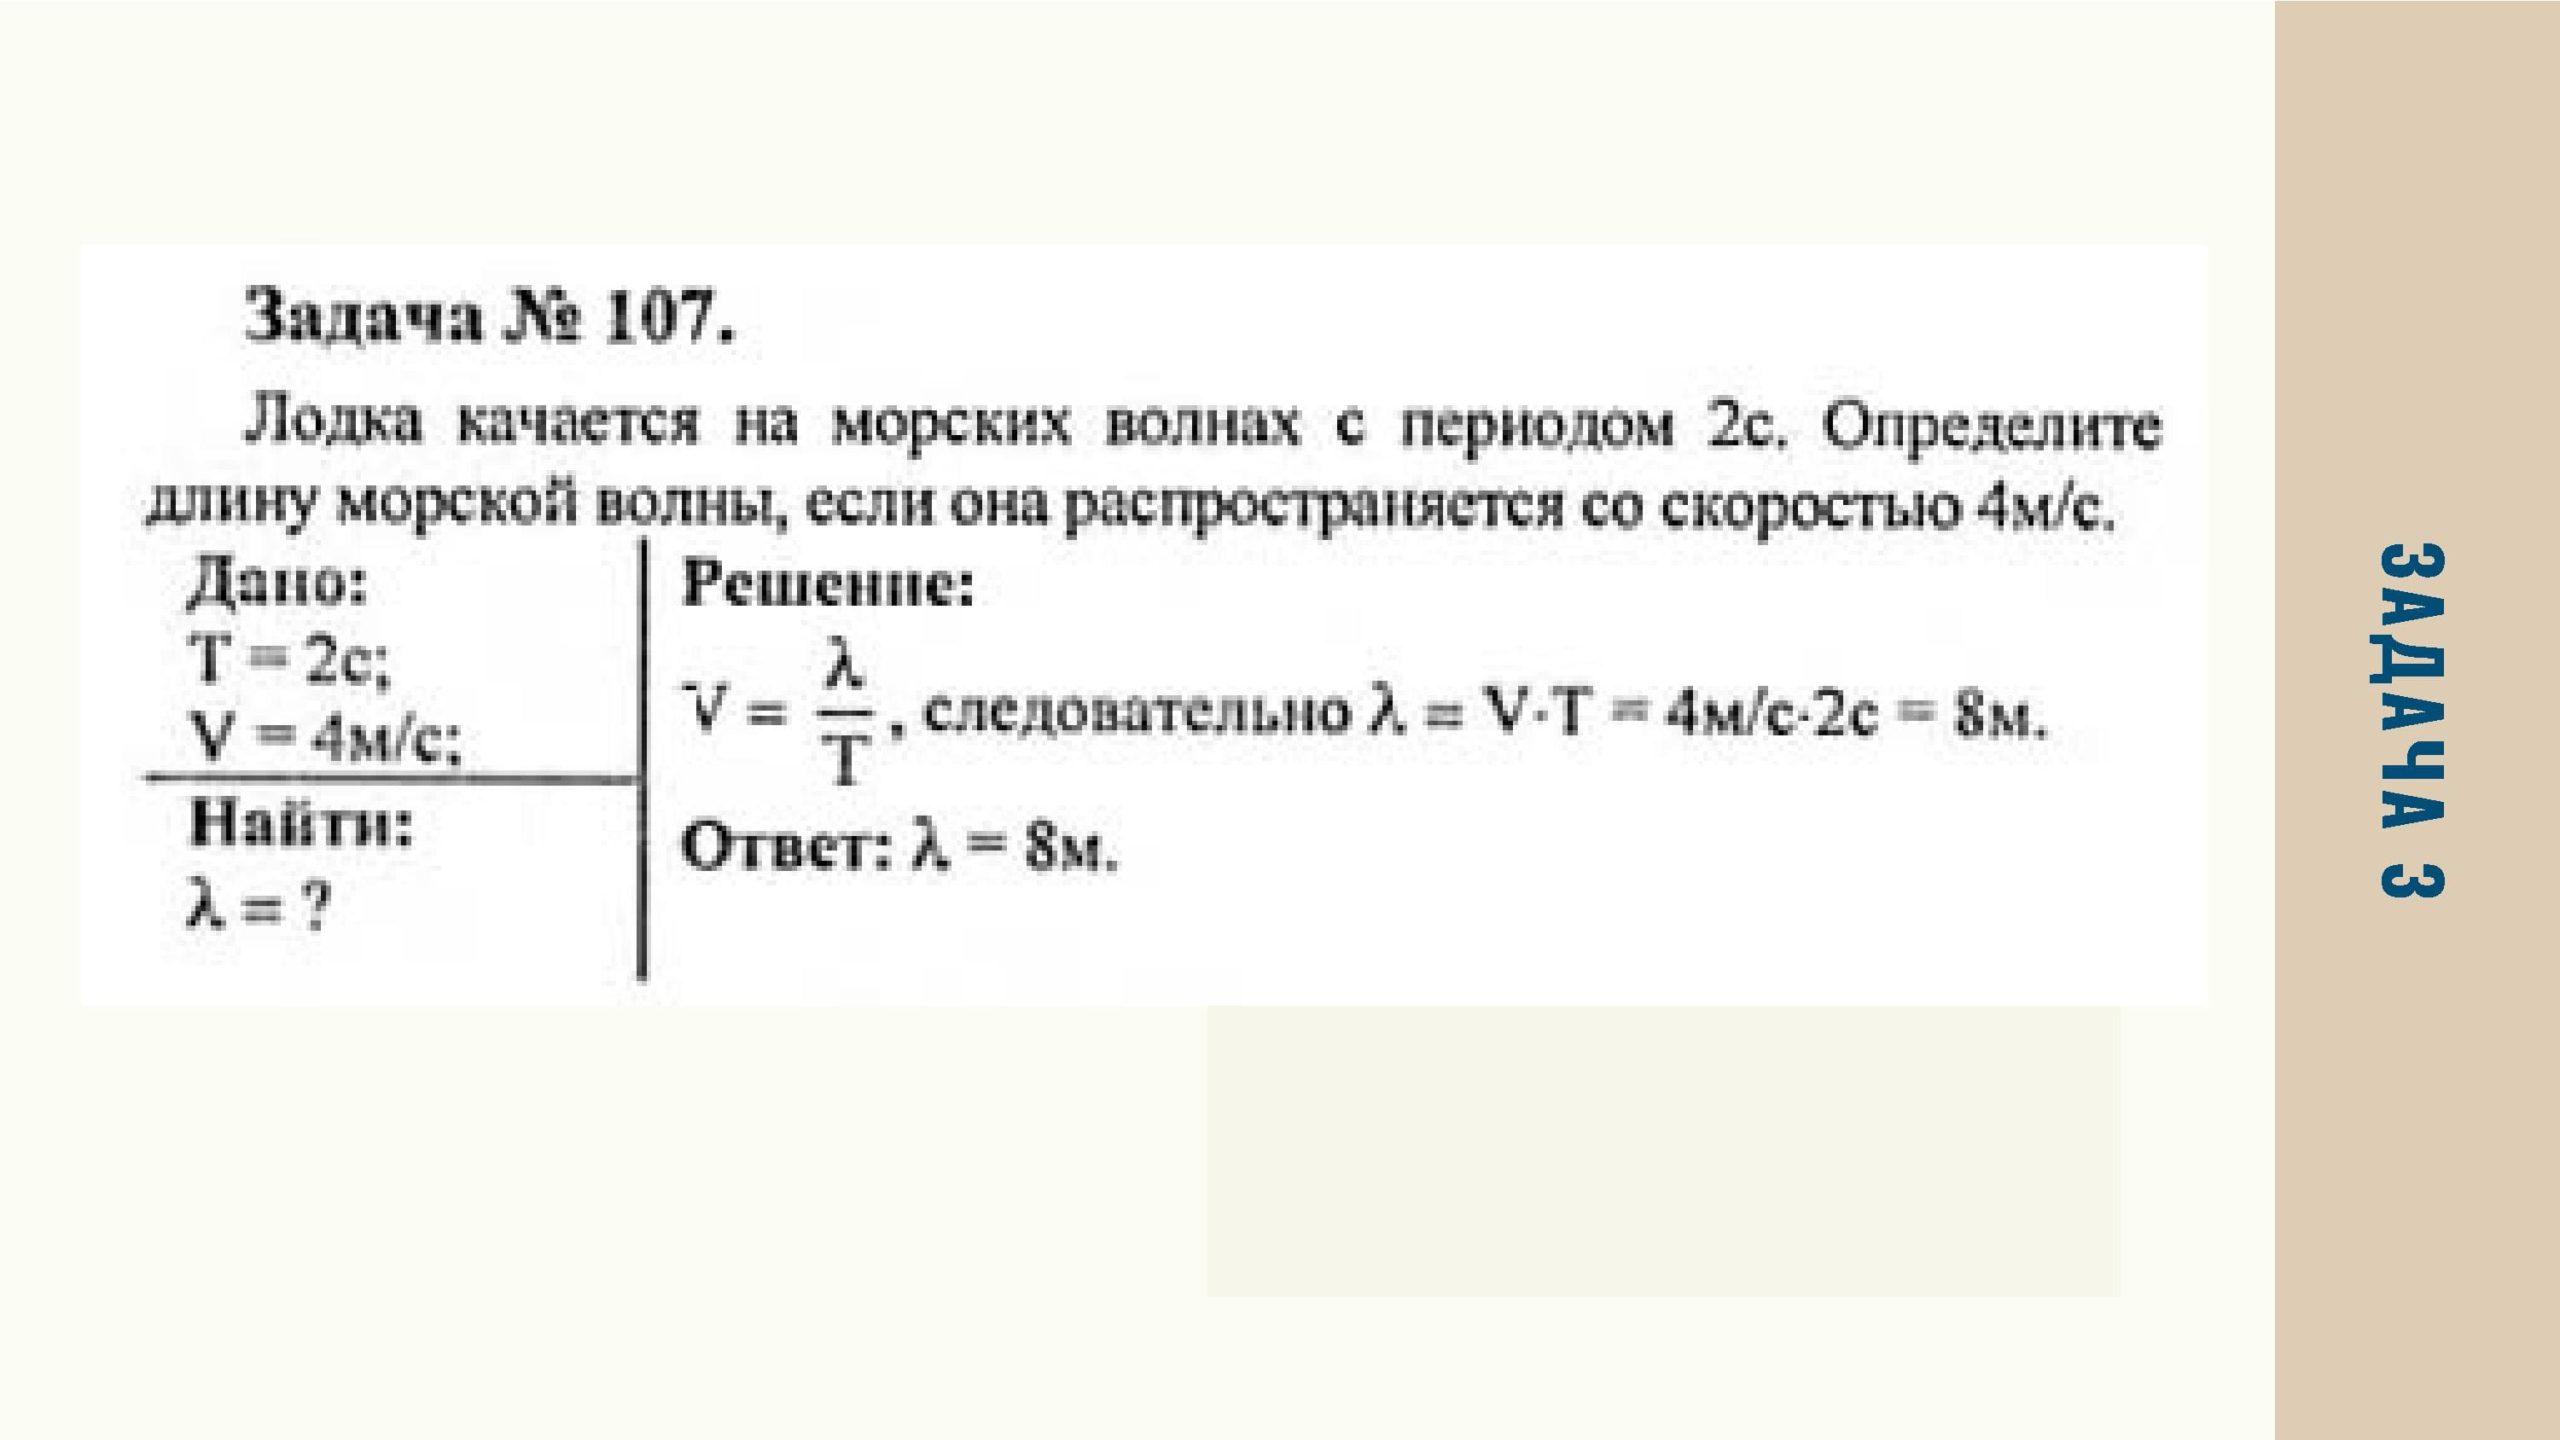 Задача 3 (107) с решением. Лодка качается на морских волнах с периодом 2 с.